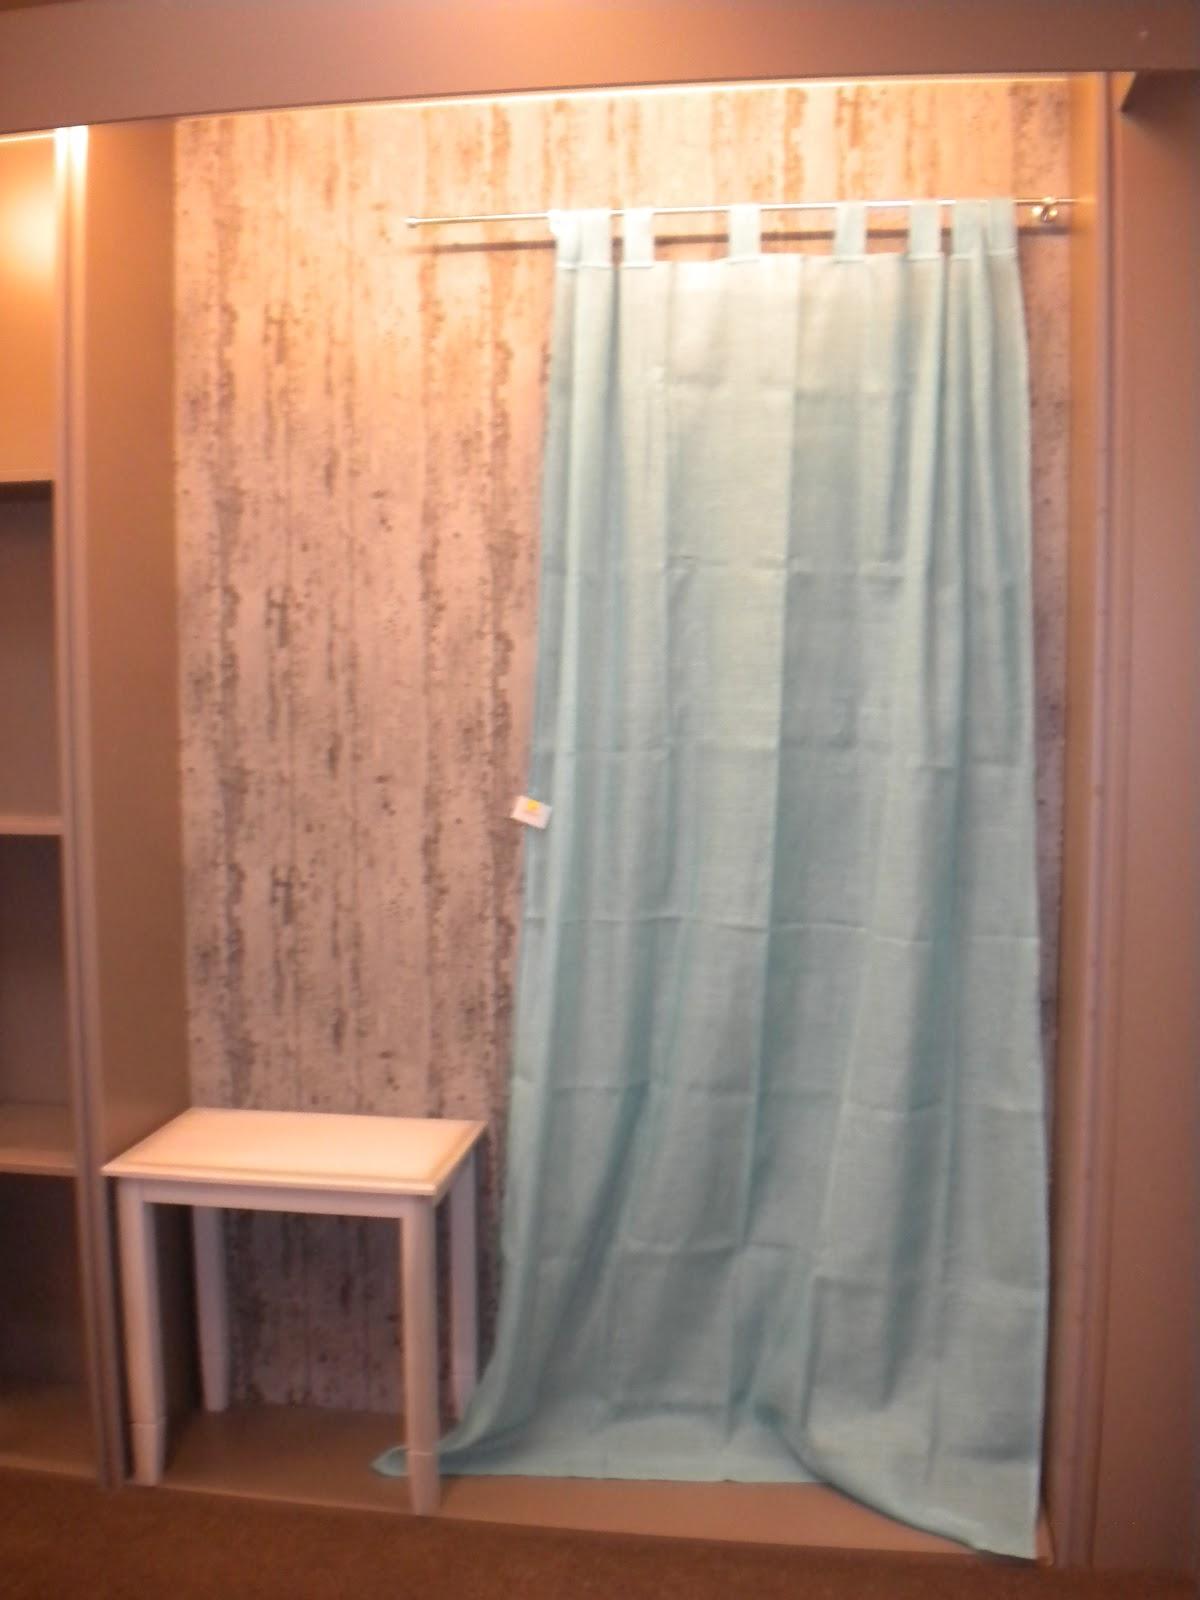 mr peinture papier peint mati re. Black Bedroom Furniture Sets. Home Design Ideas